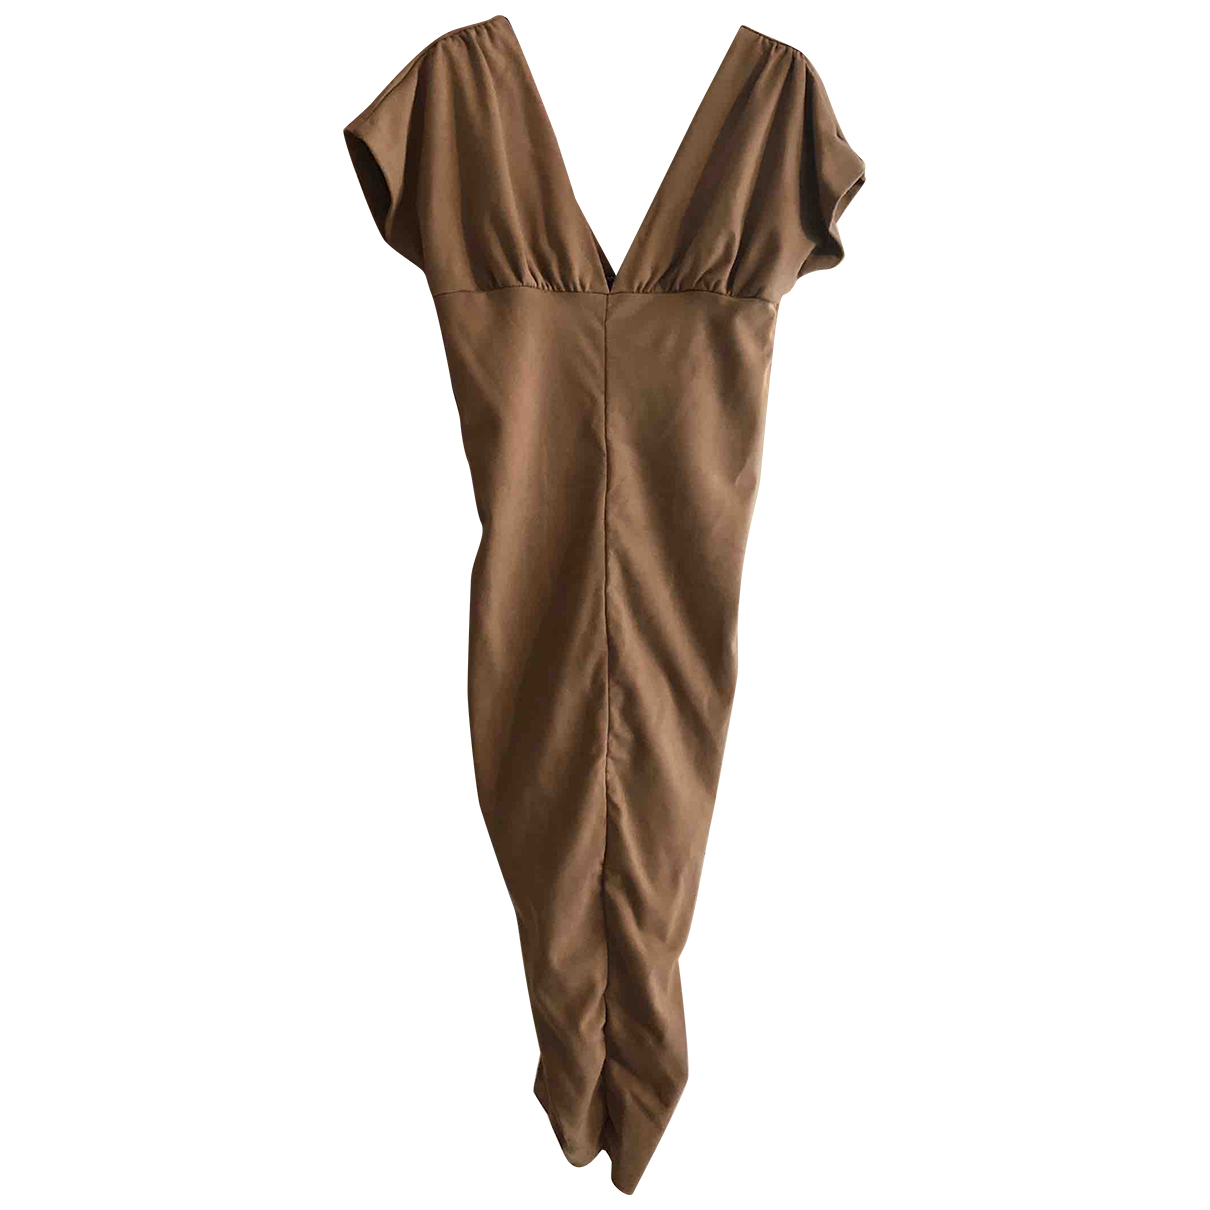 Mangano \N Kleid in  Kamel Synthetik